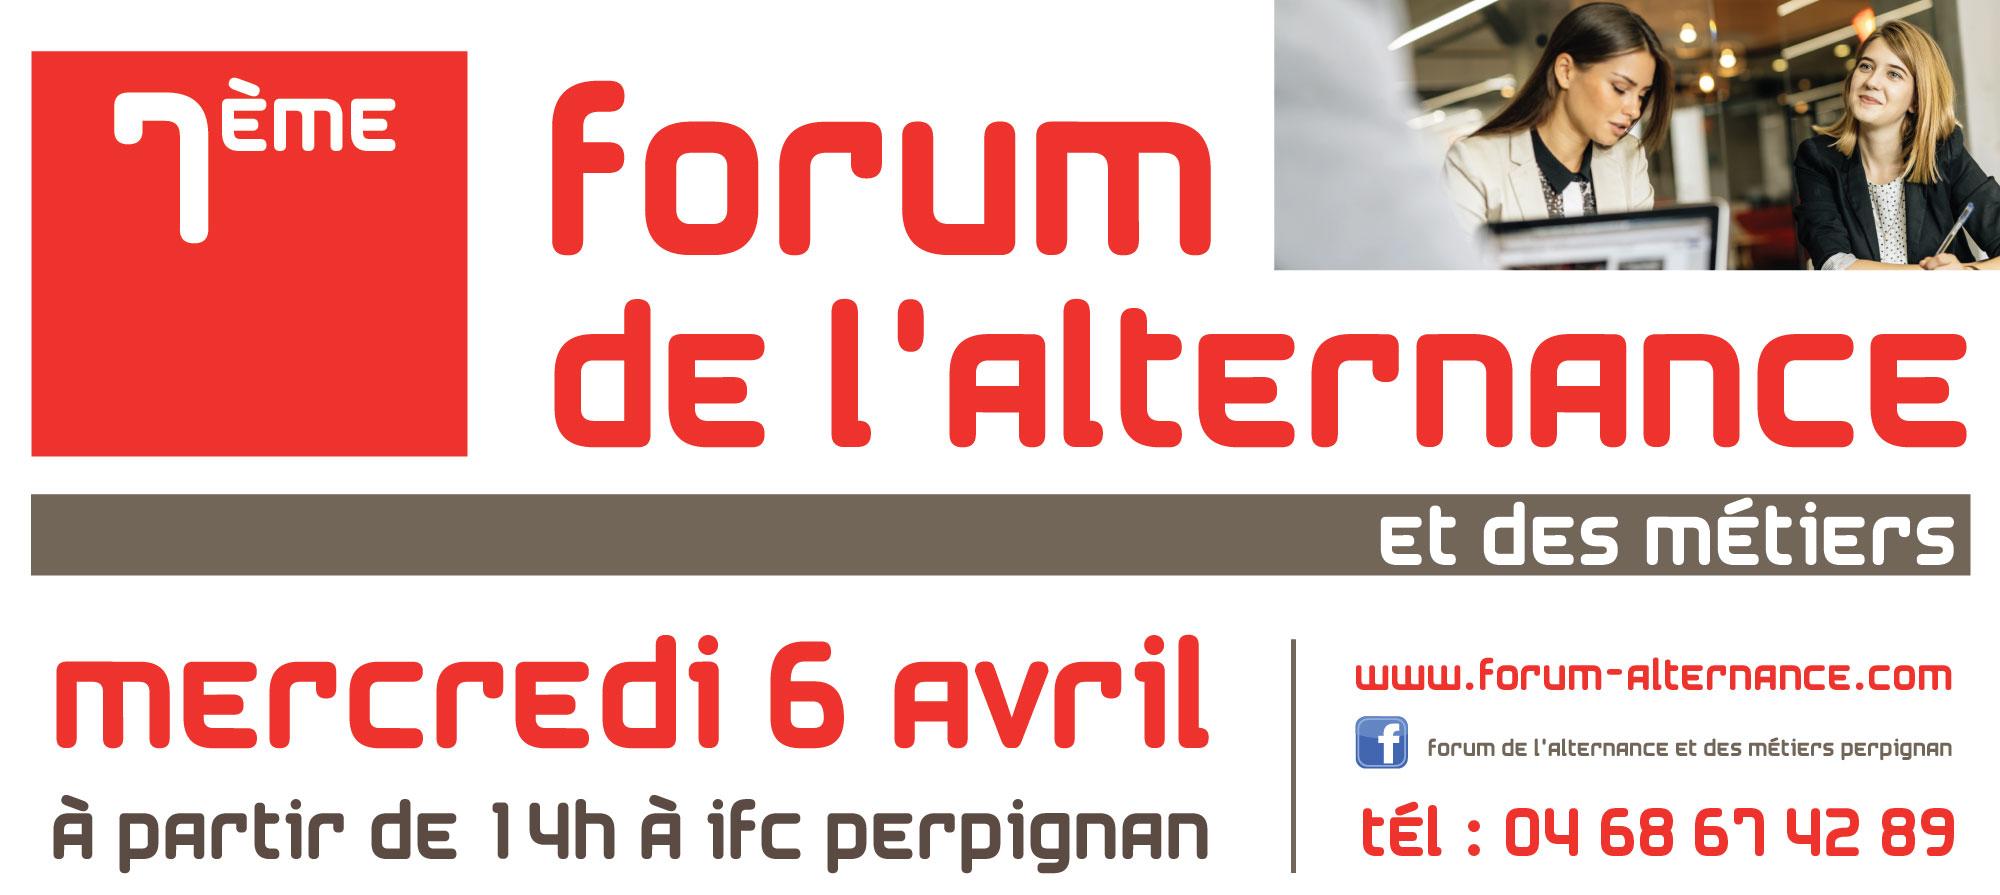 forum-alternance-2016